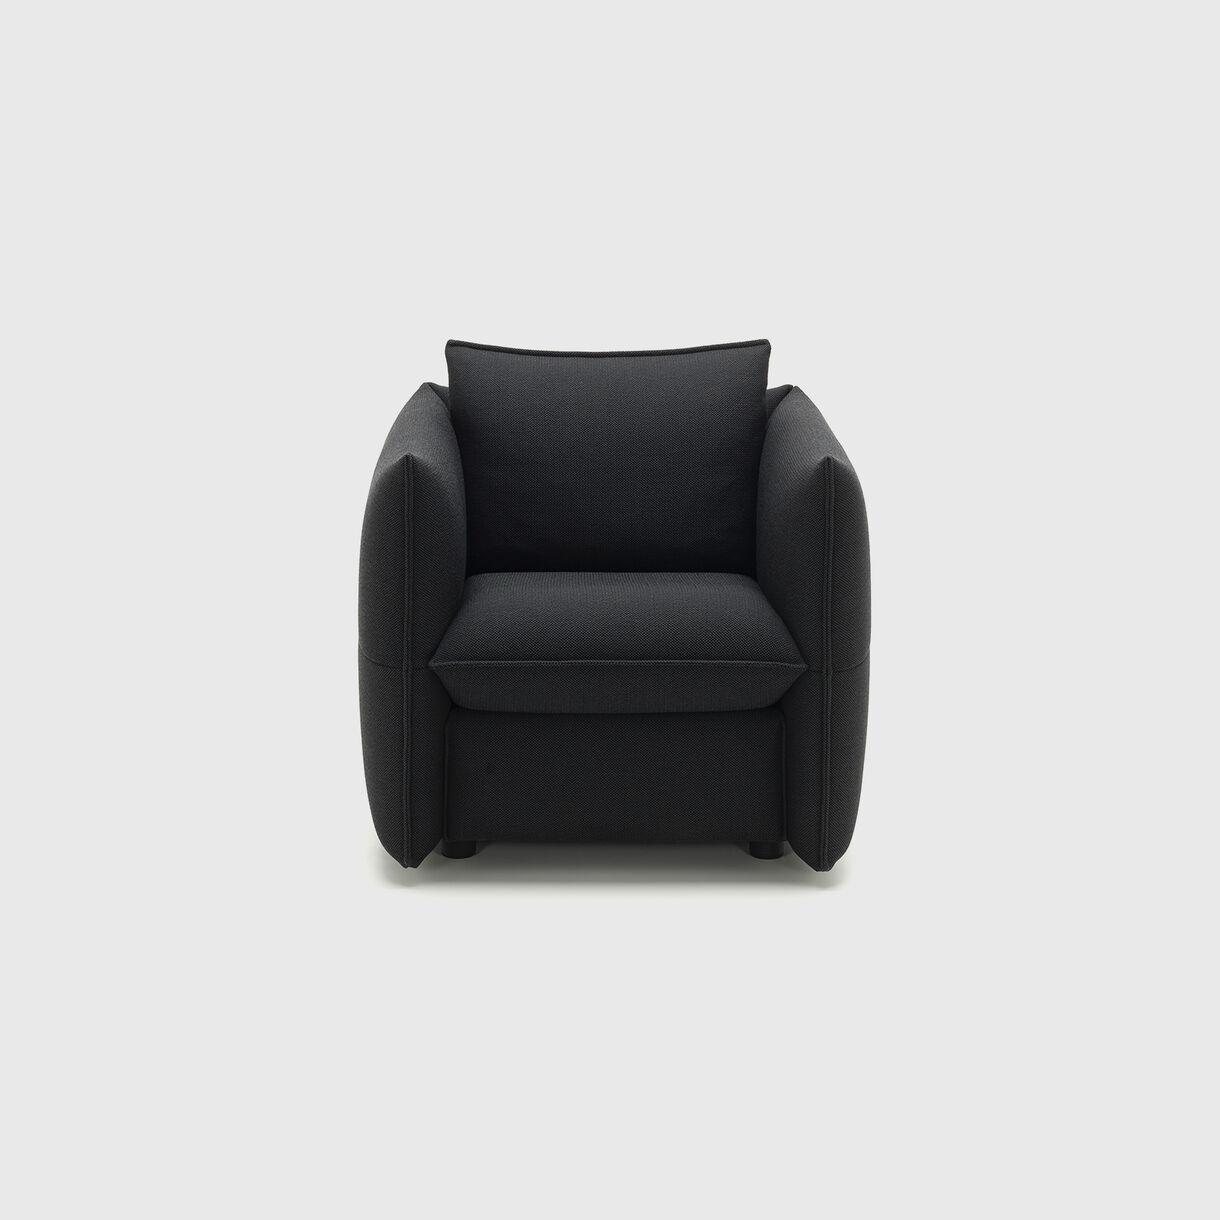 Mariposa Club Armchair, Black Anthracite